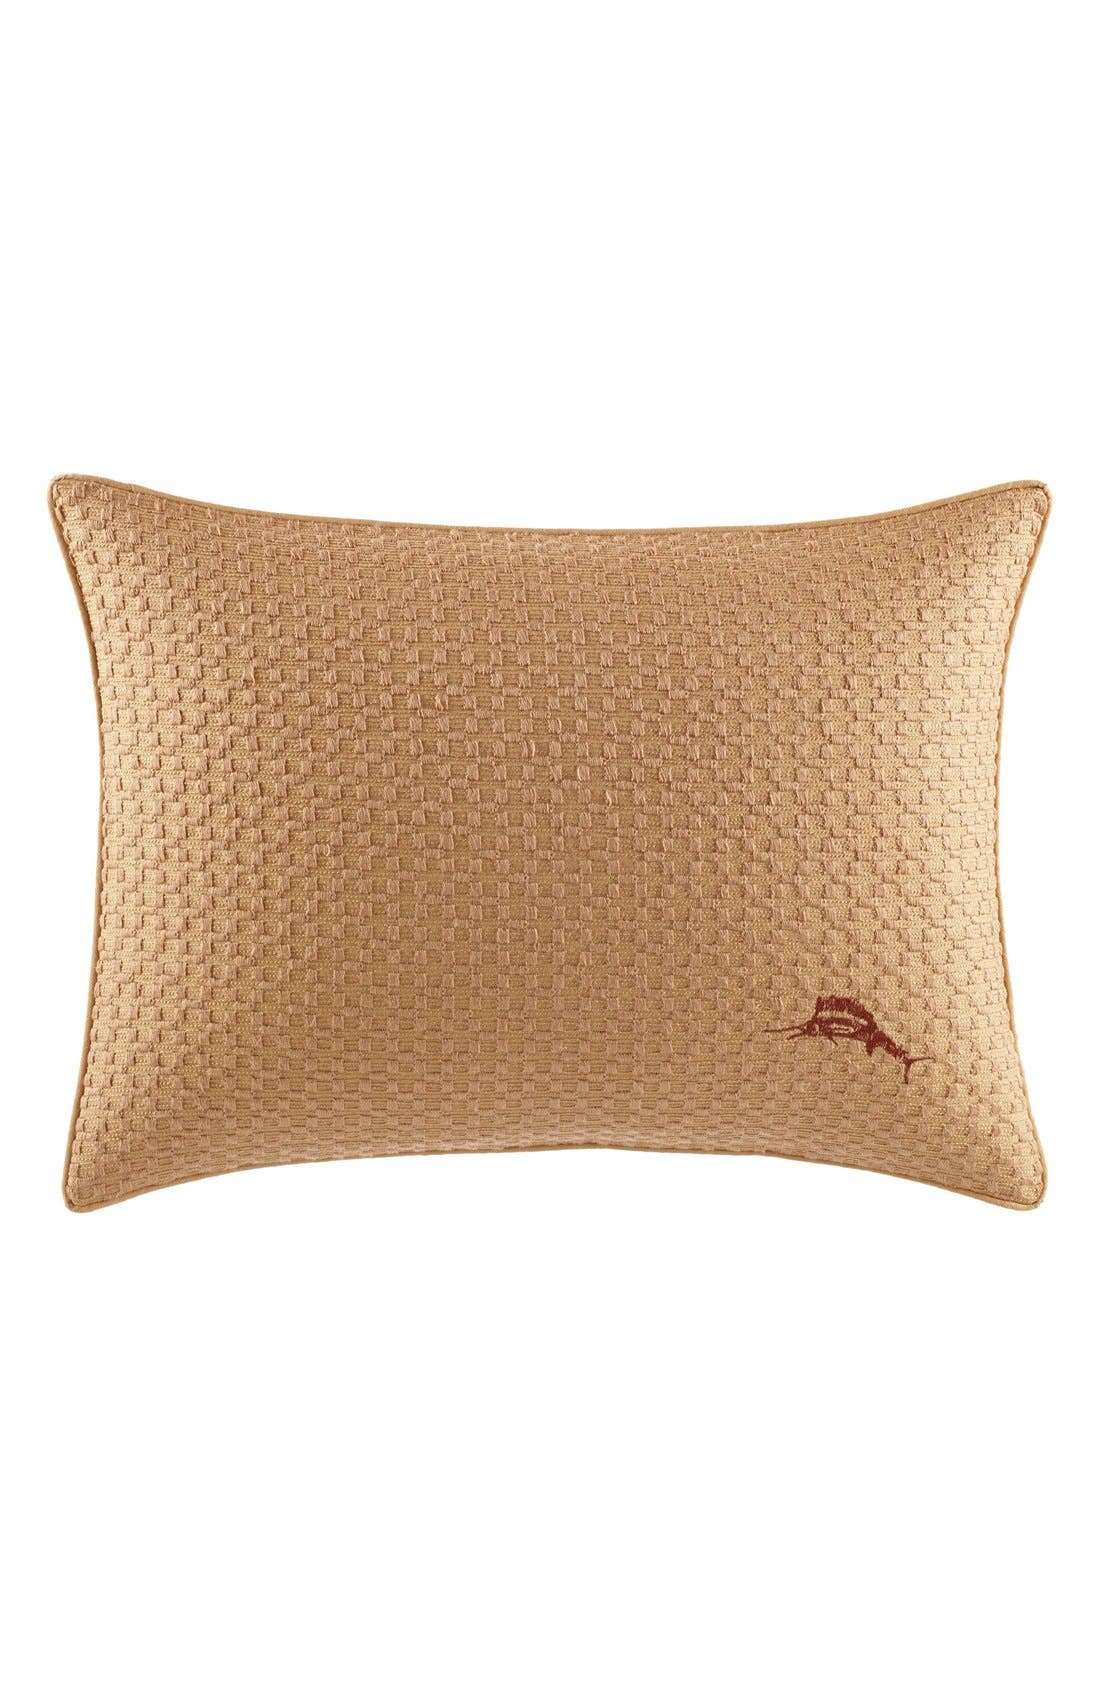 Tommy Bahama Cayo Coco Pillow